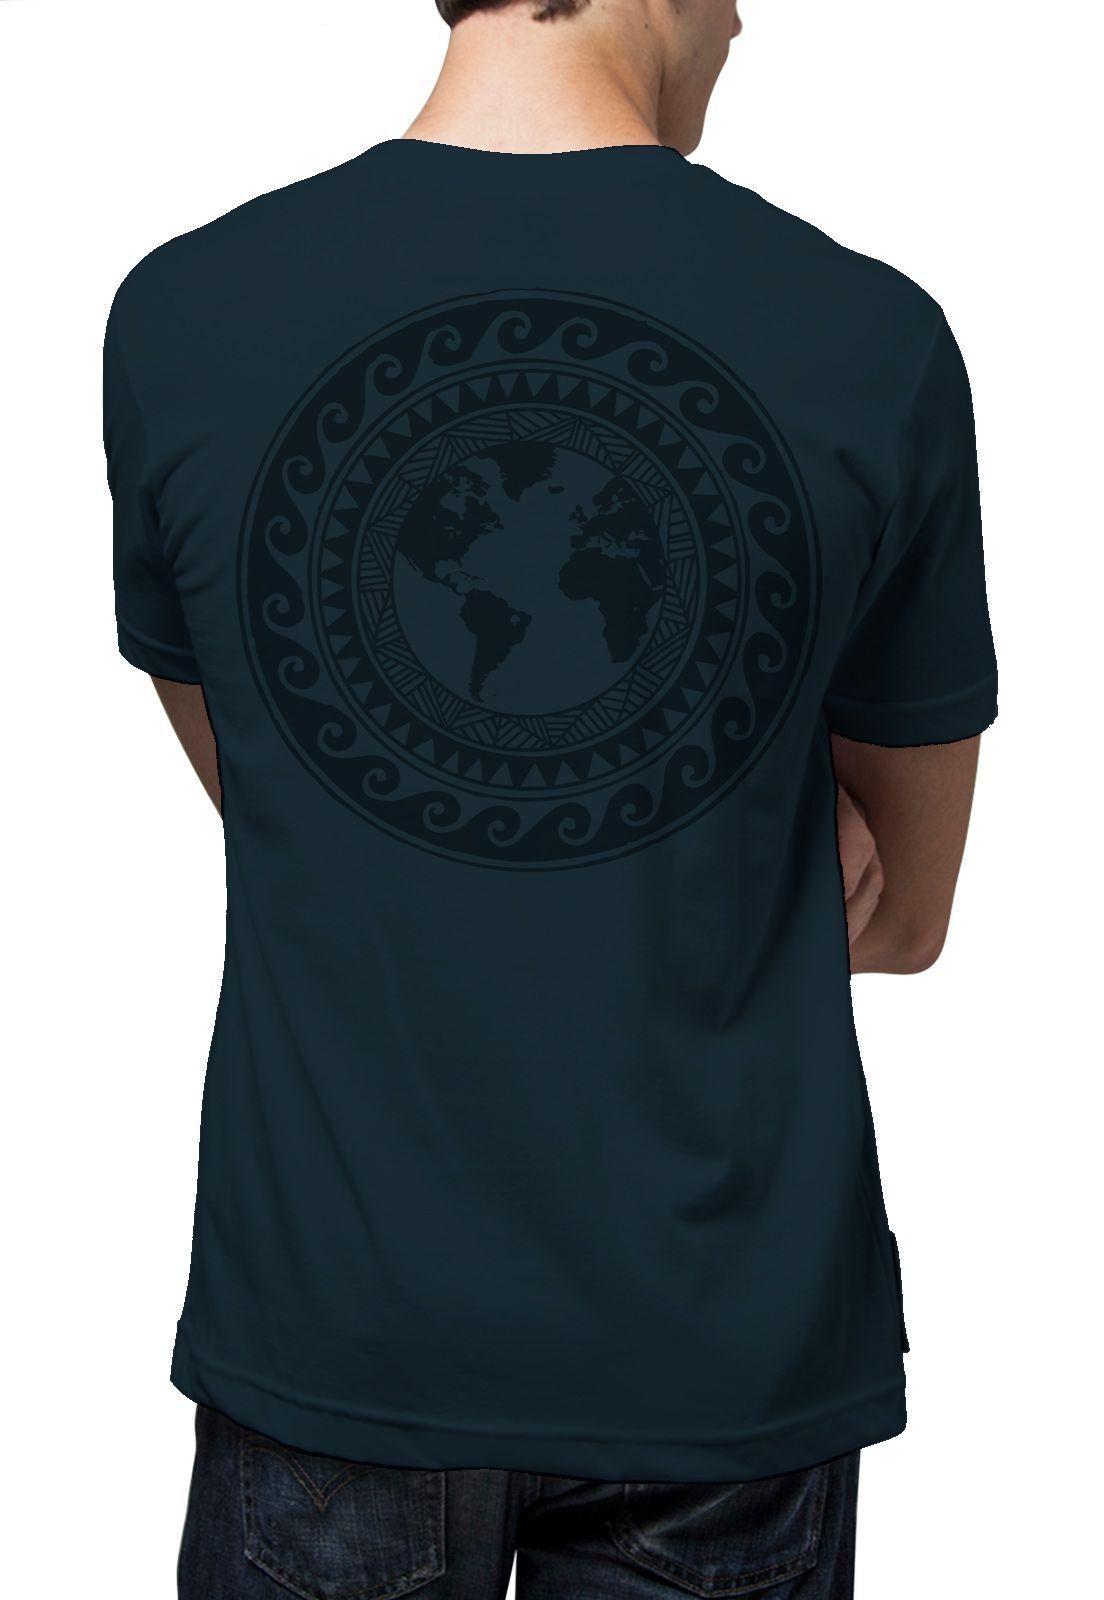 Camiseta Amazônia Mandala Mundo - Azul Escuro